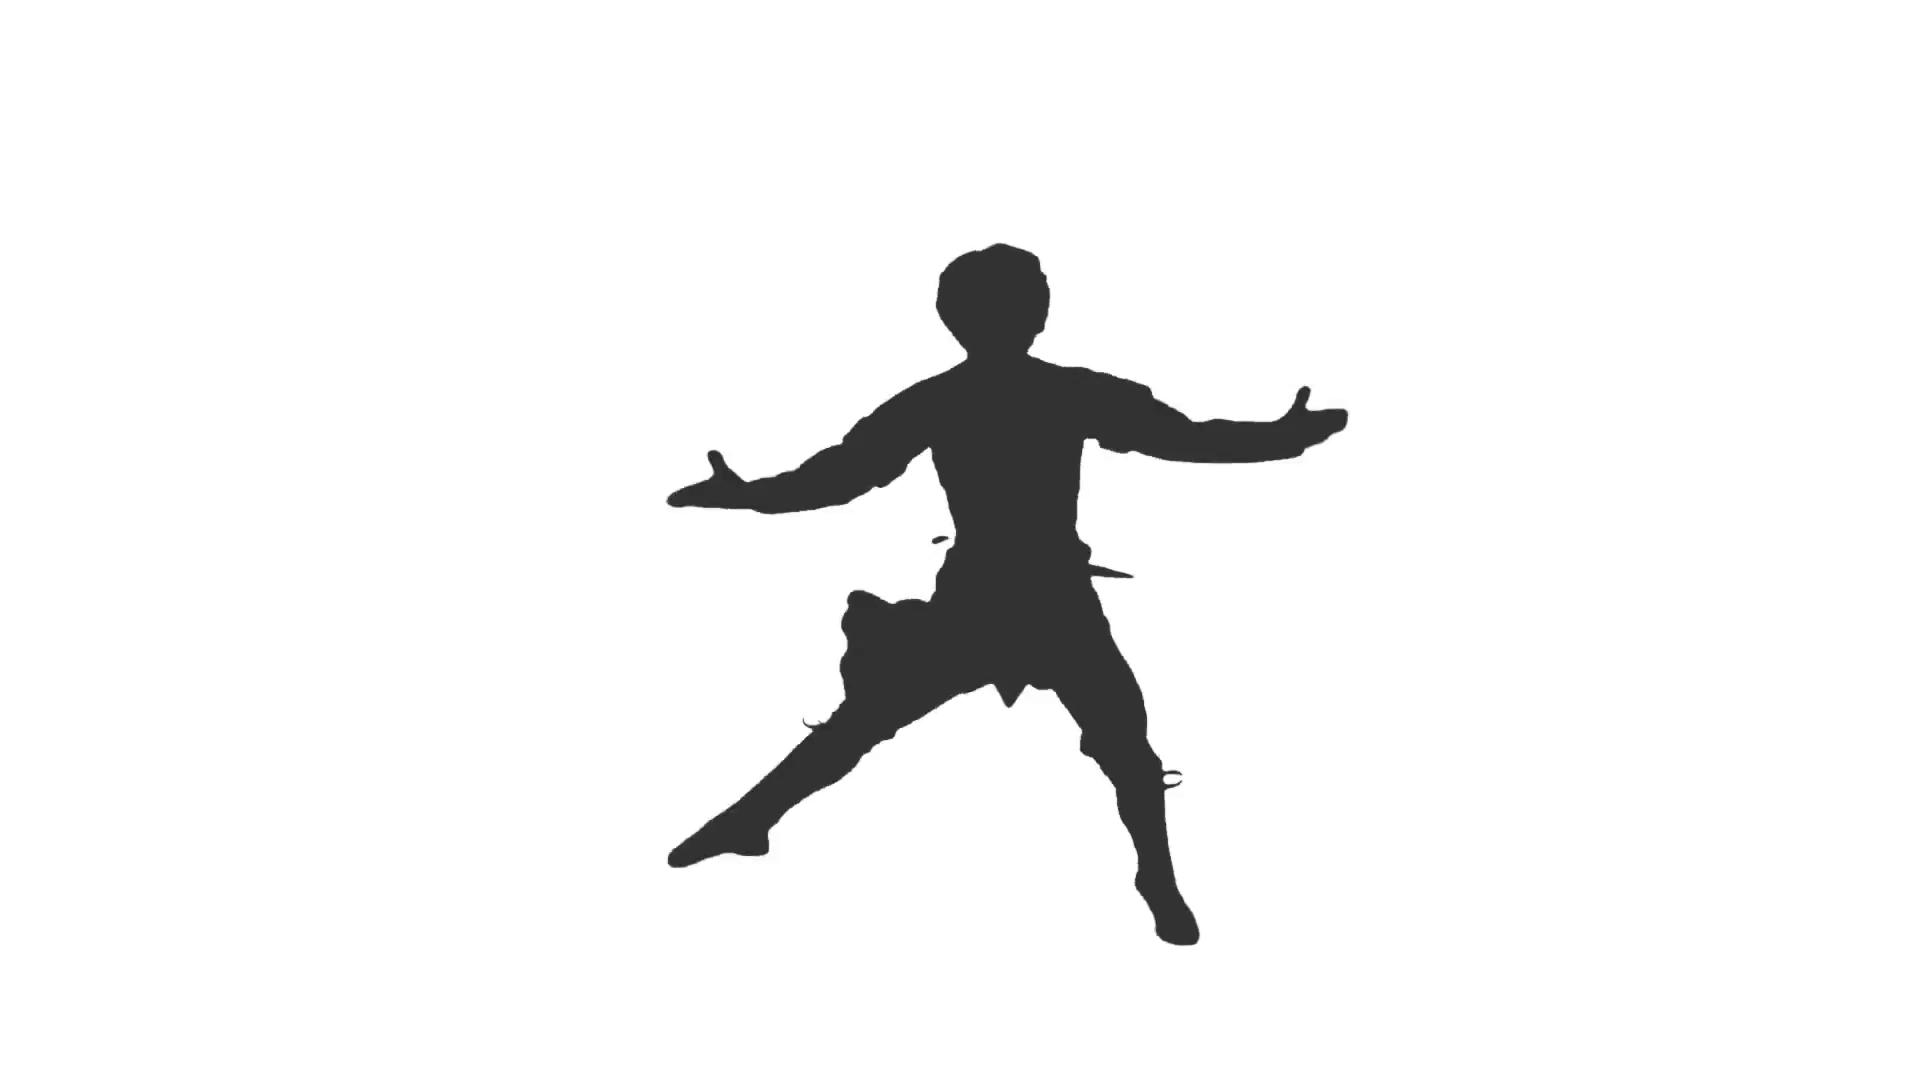 1920x1080 Silhouette Of A Man Dancing. Dancing Silhouette. Dances Of Georgia